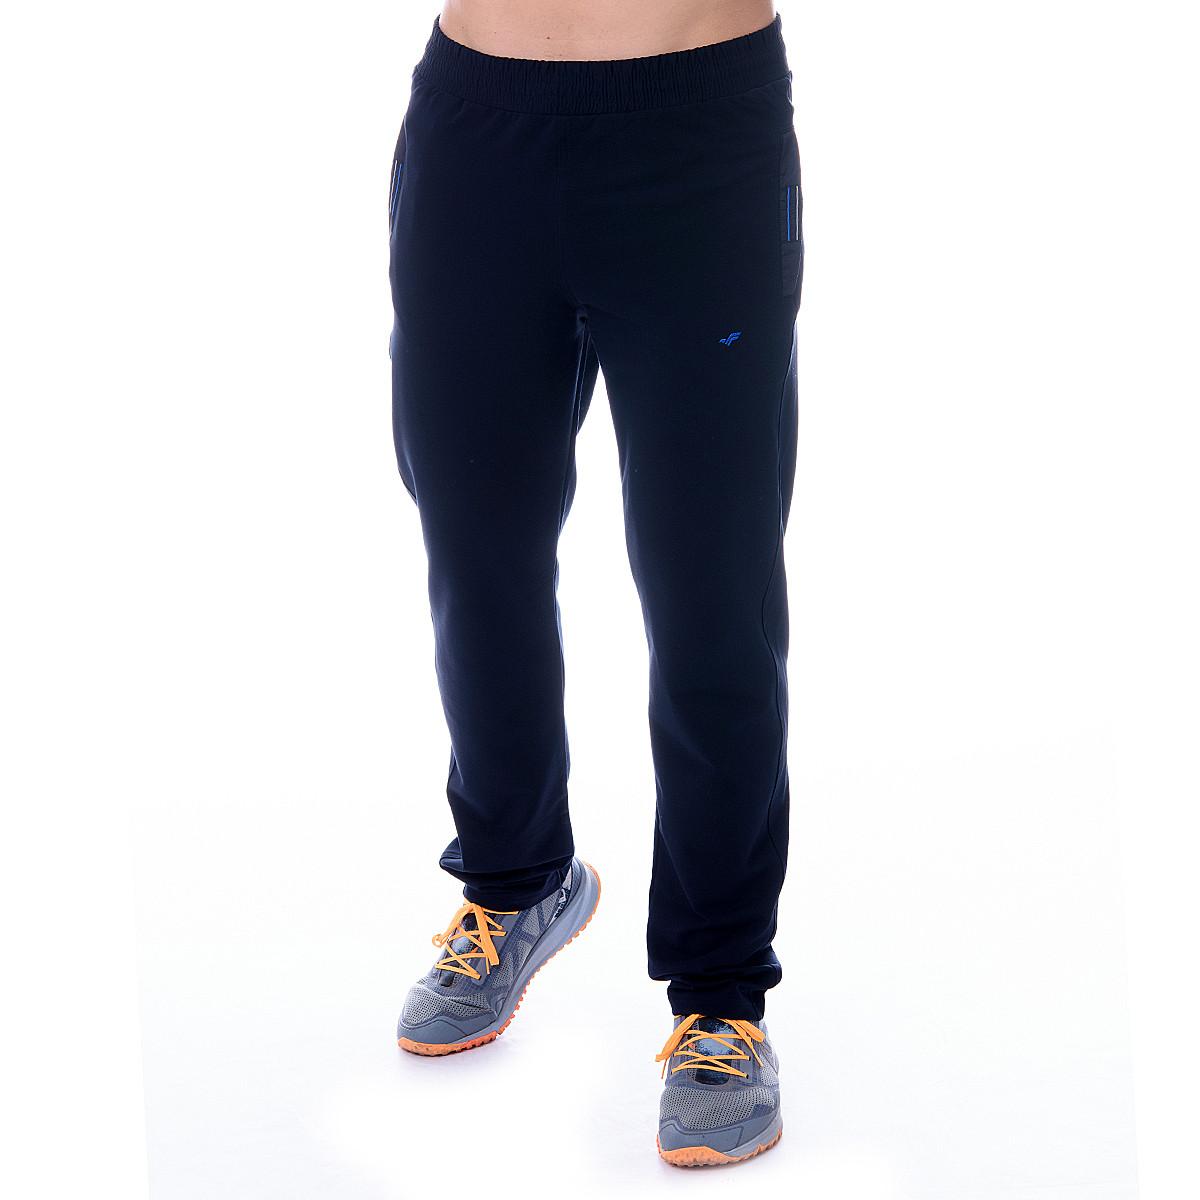 Мужские спортивные штаны Турция XL-3XL  тм. FORE арт.9415g